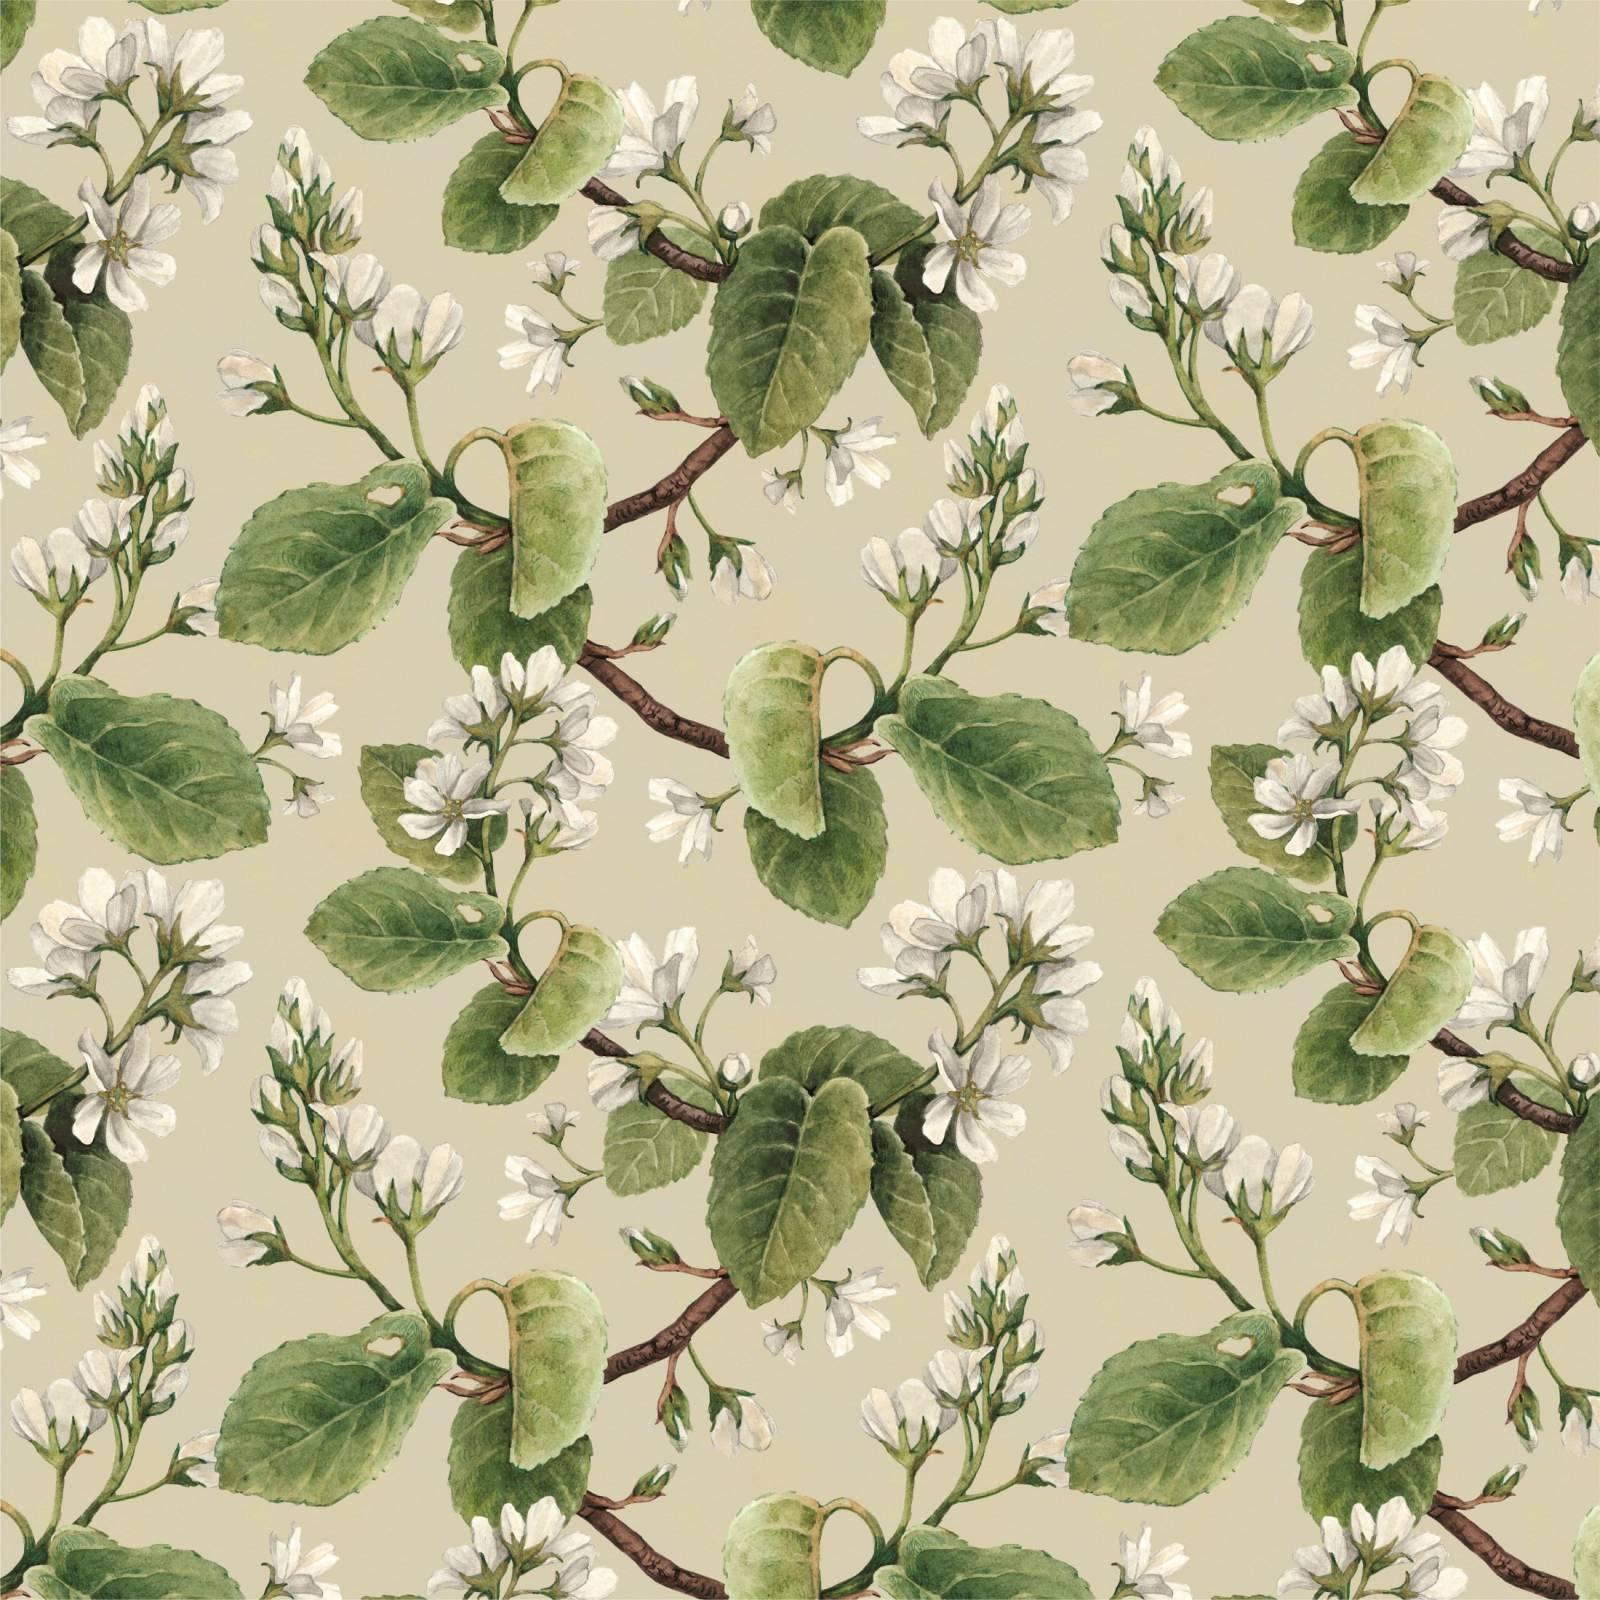 Papel de Parede Adesivo Floral Folhas /Rolo imagem 1